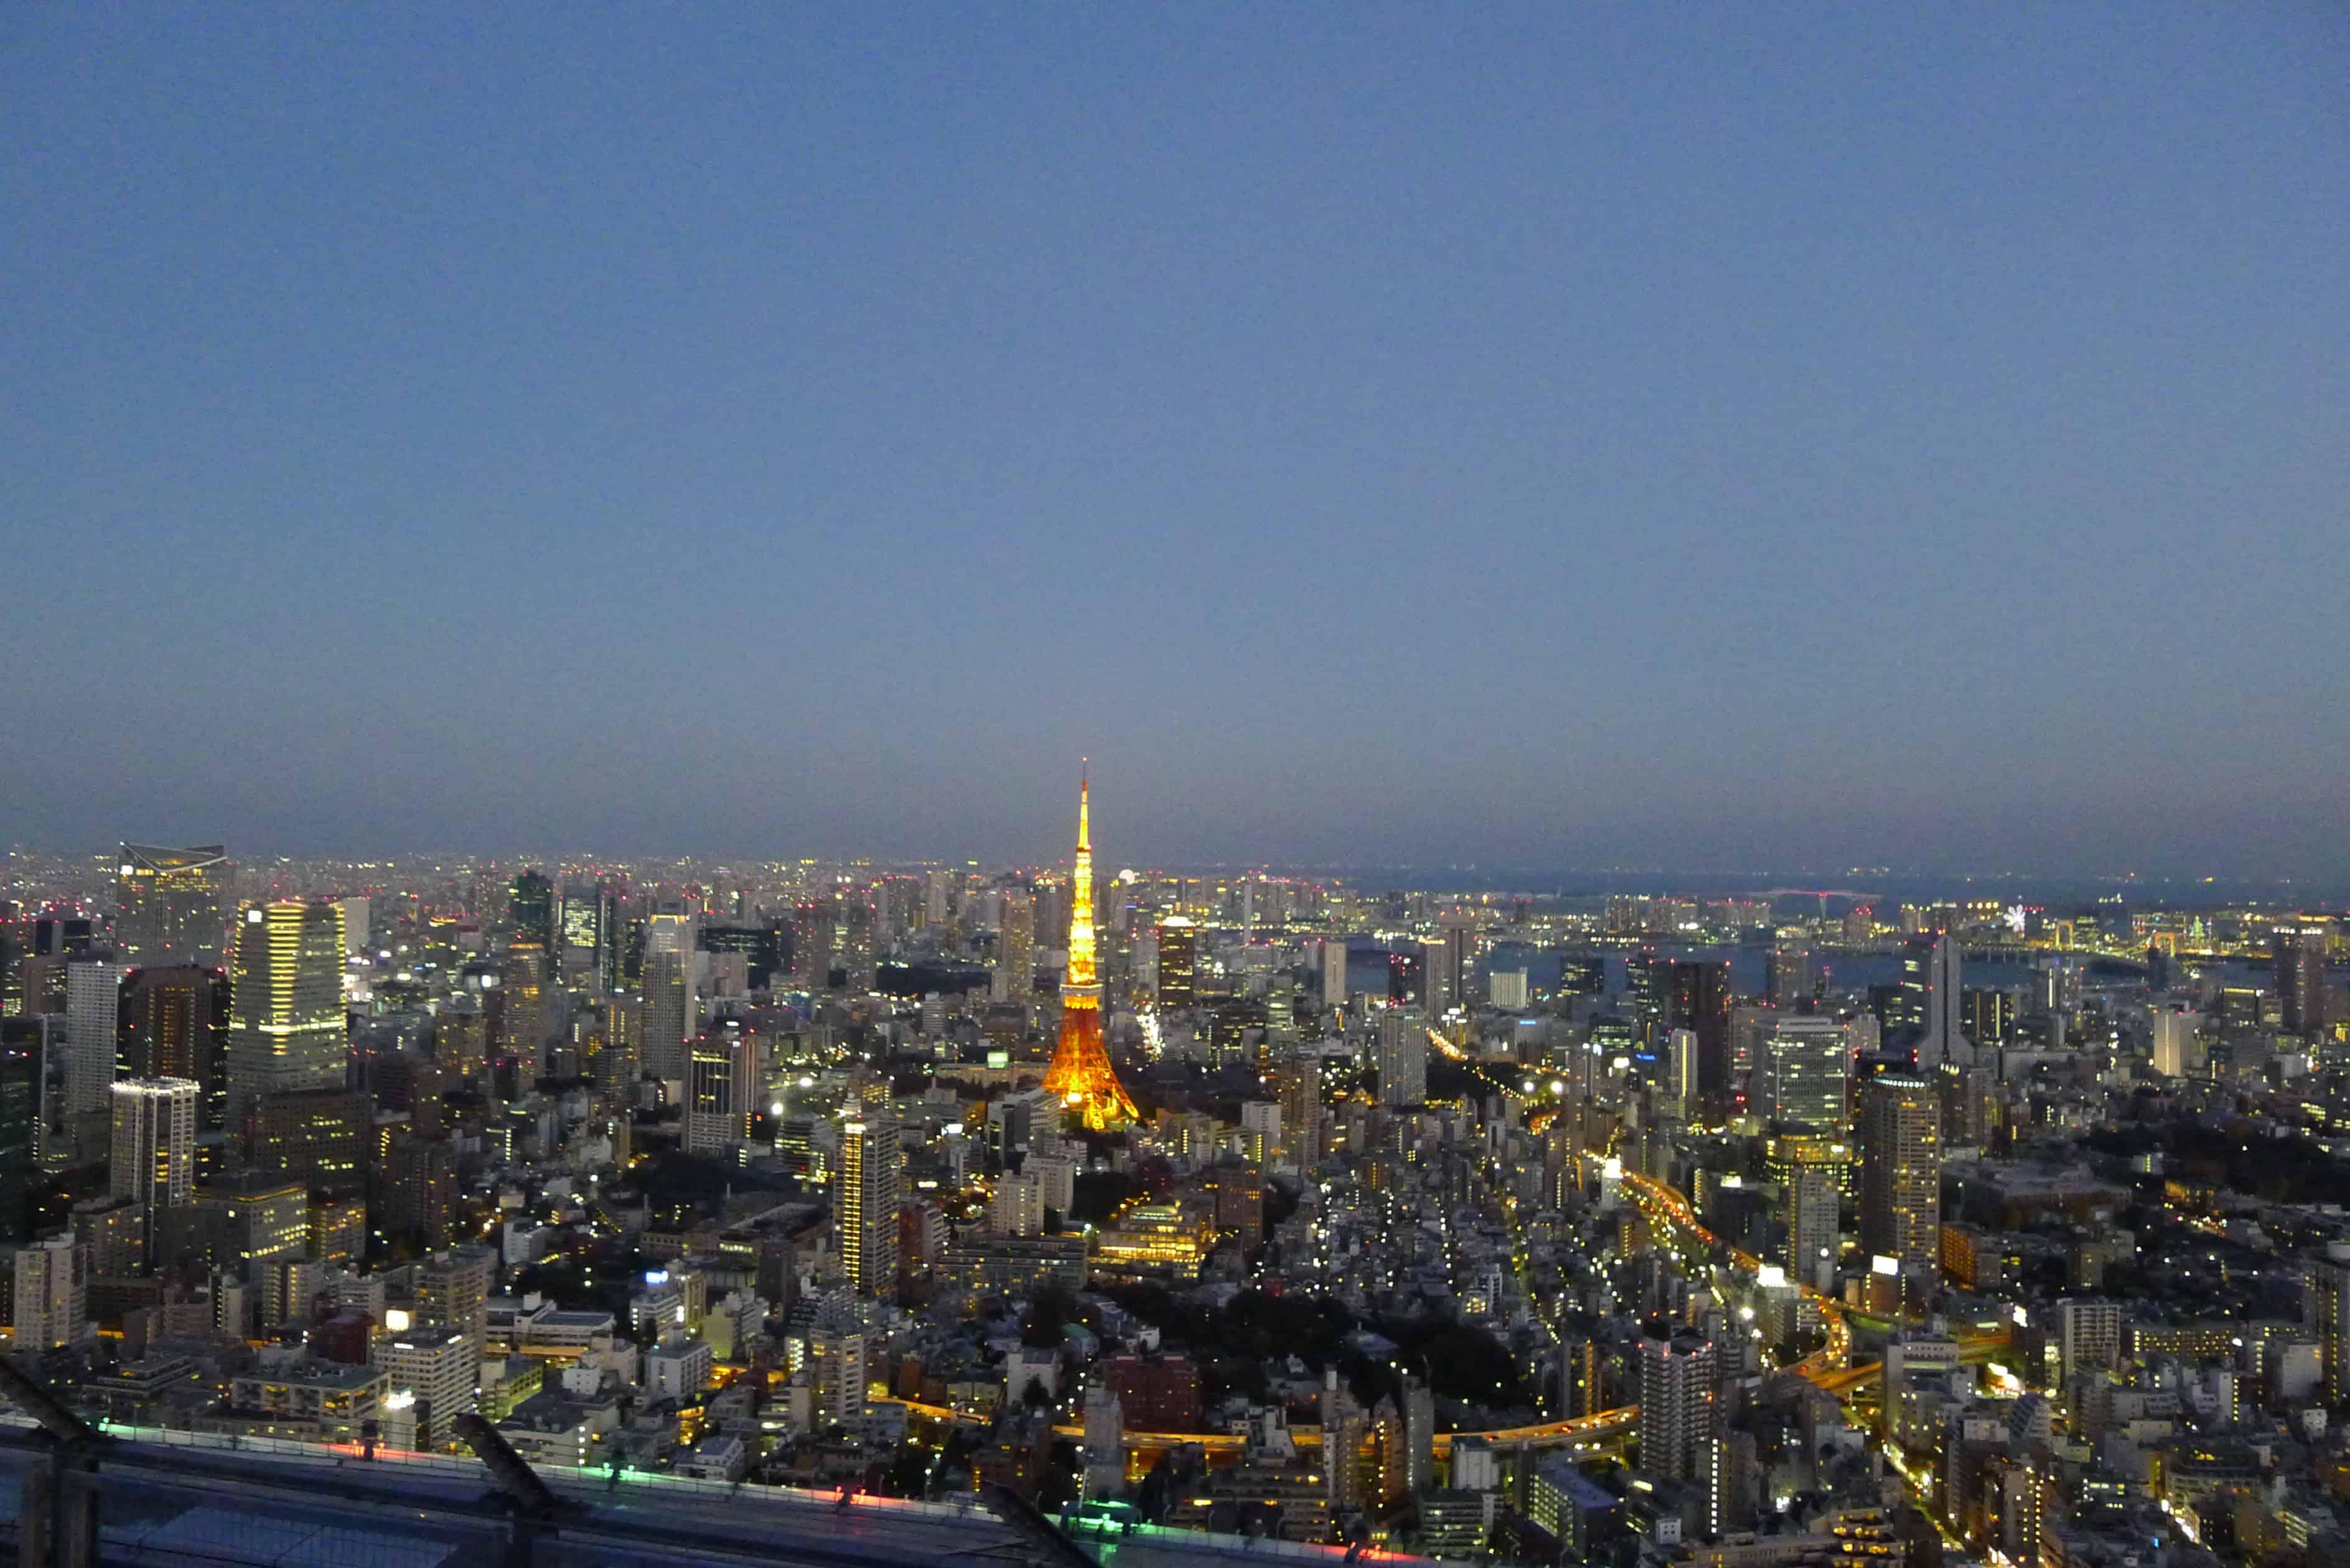 Tokyo Tower แบบไม่มีอะไรมาบดบังสายตา บนดาดฟ้าตึก Mori Tower